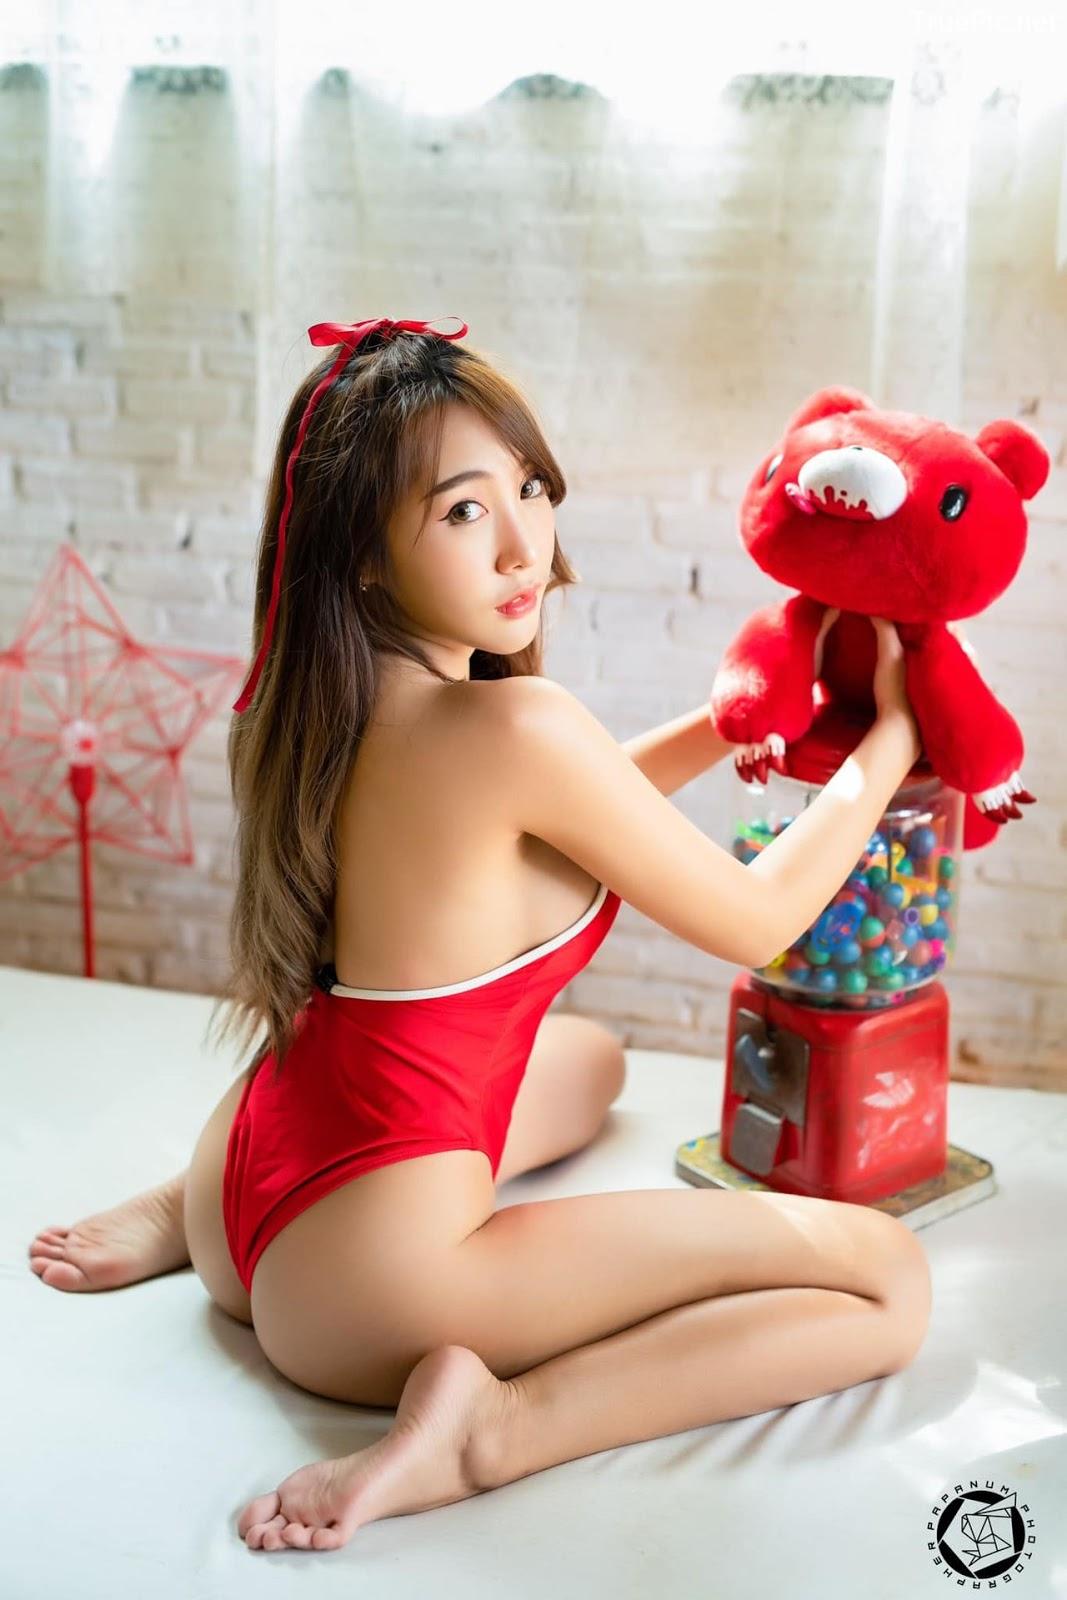 Image-Thailand-Sexy-Model-Suneta-Ngachalvy-Concept-Gloomy-Bear-TruePic.net- Picture-1